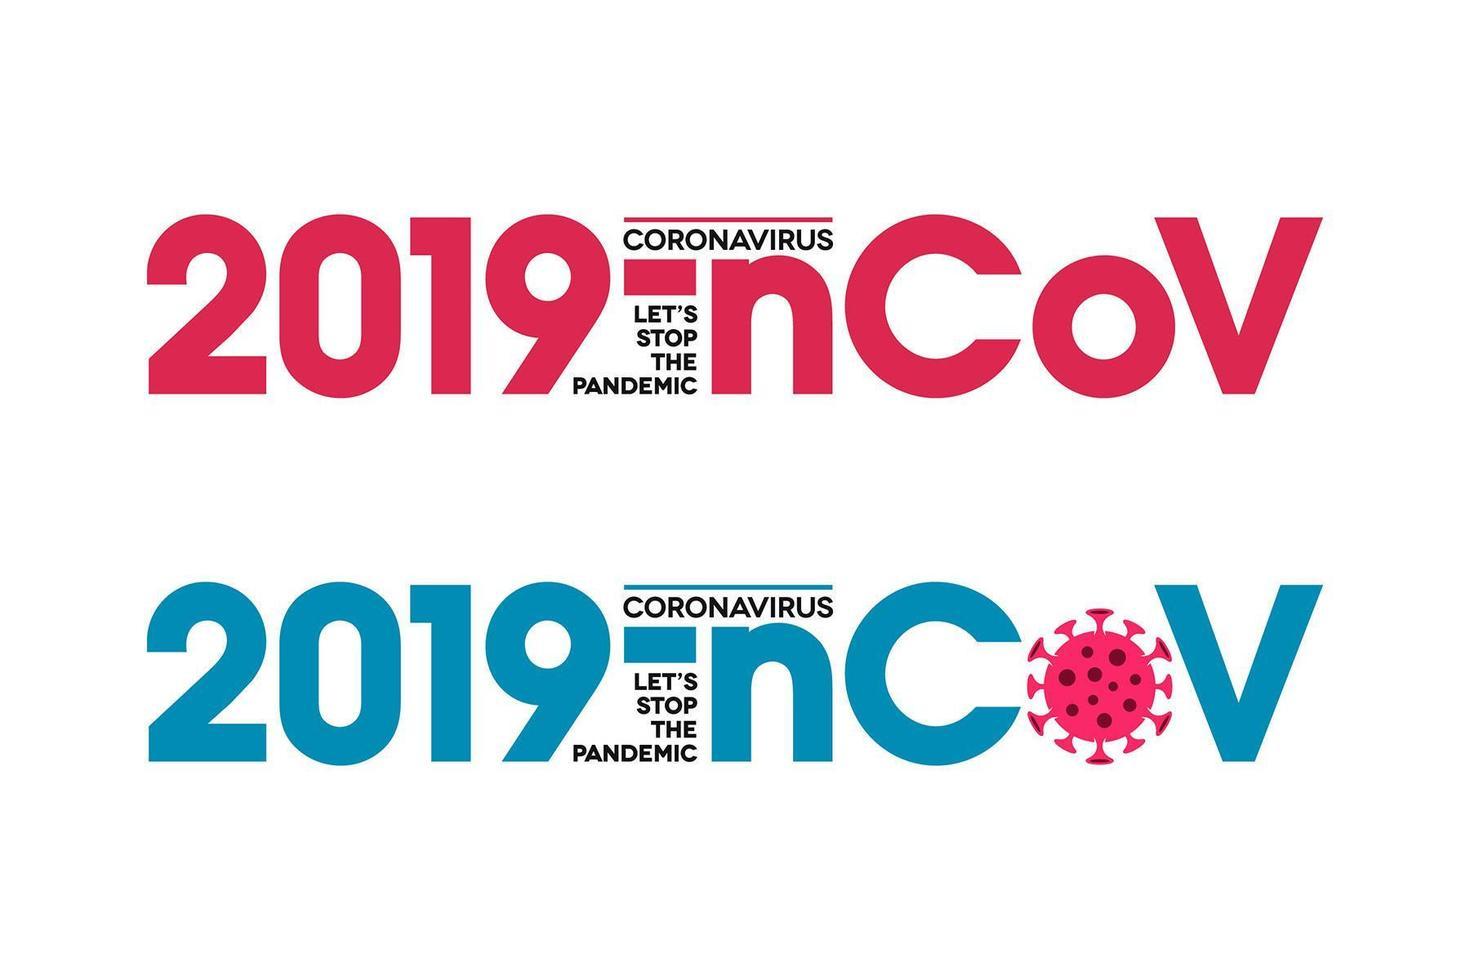 2019-nCoV Typographic Lettering Coronavirus Icon vector